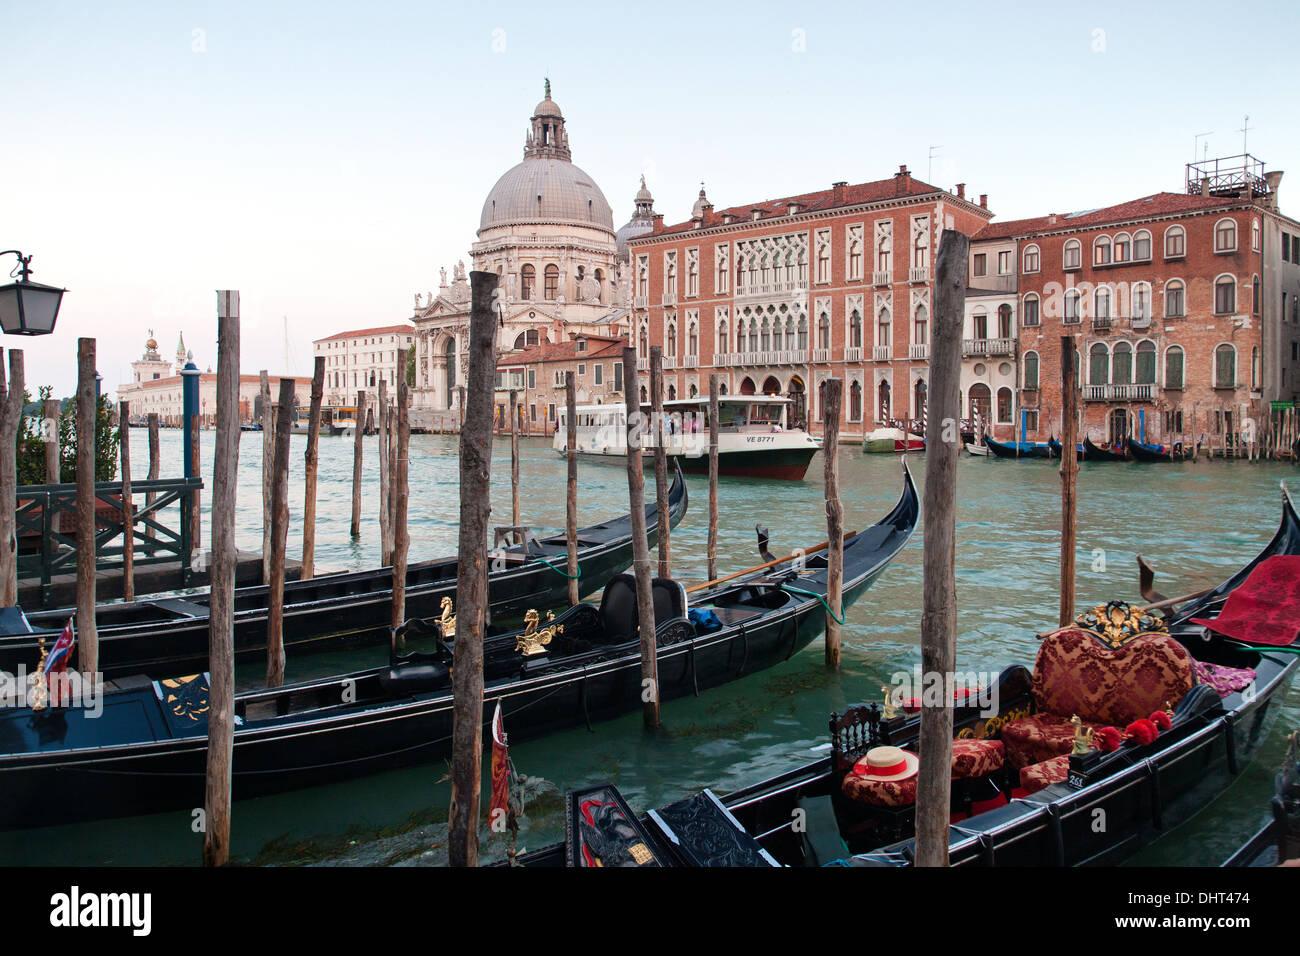 Gondolas on the Grand Canal and view to the church of Santa Maria della Salute, Venice, Italy - Stock Image